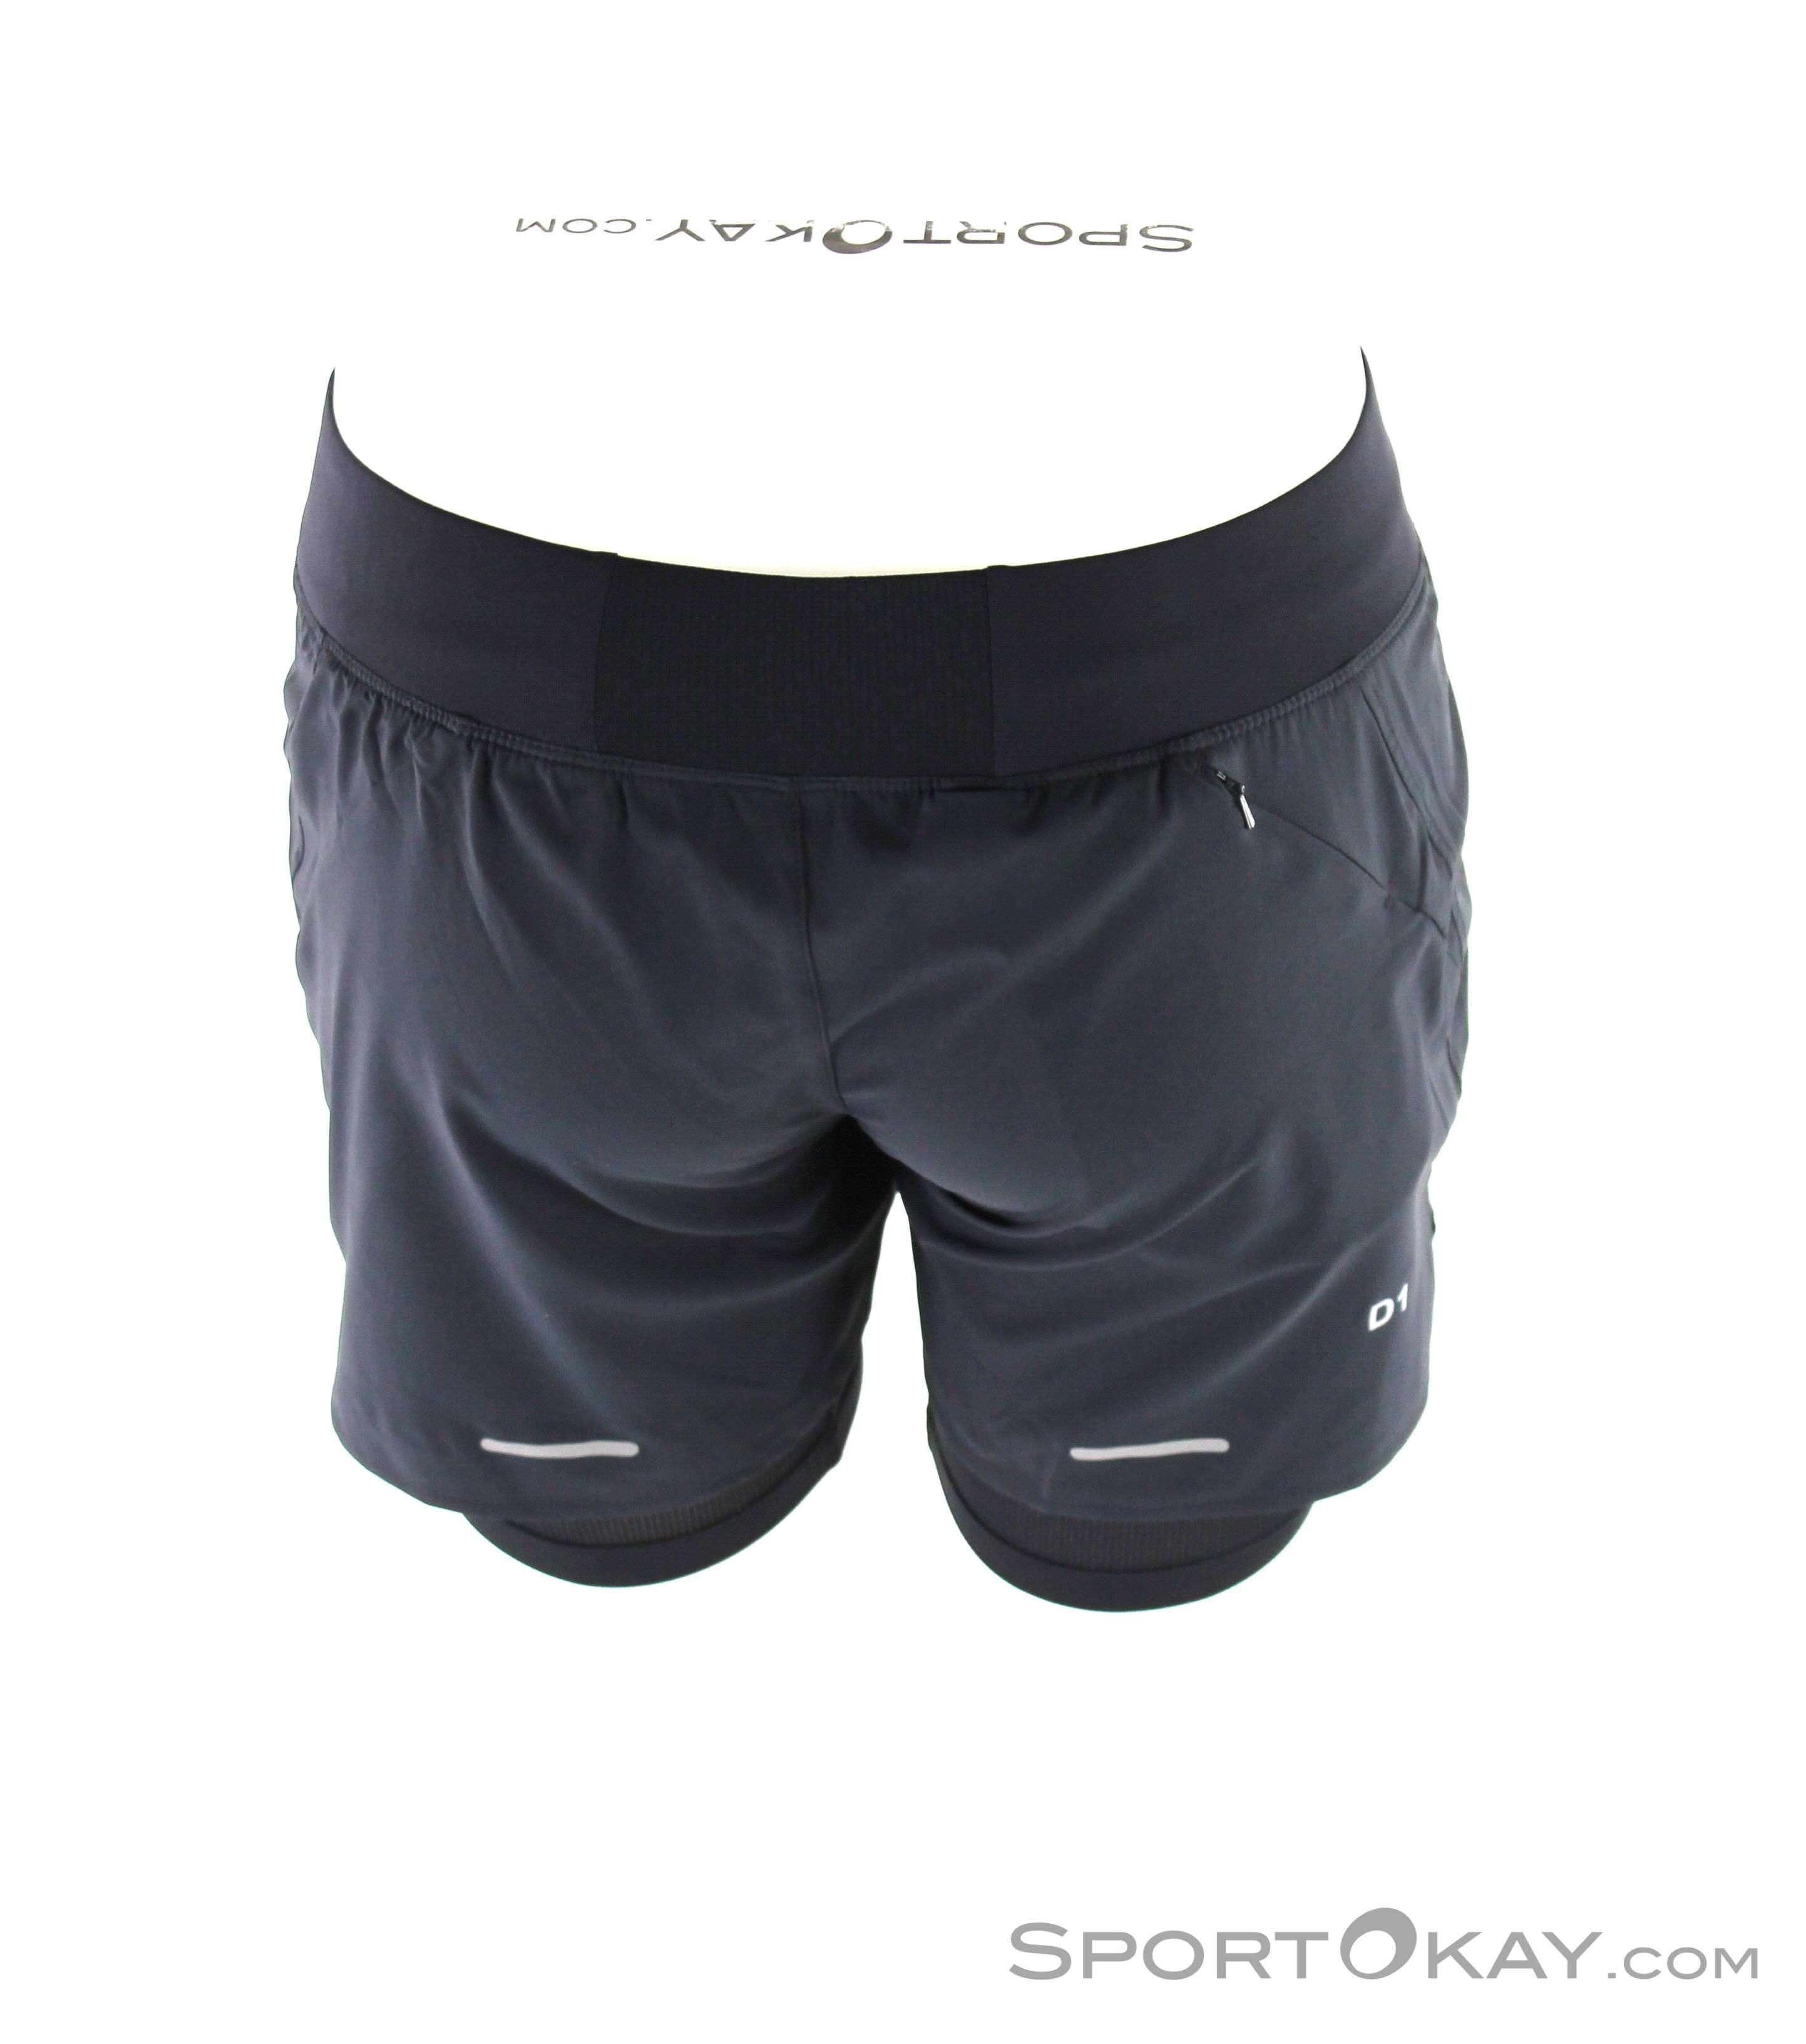 1f25c21ee4 5 Da Corsa 5in 2 Pantaloncini Asics Donna 1 Pantaloni In 18wtIxIq0